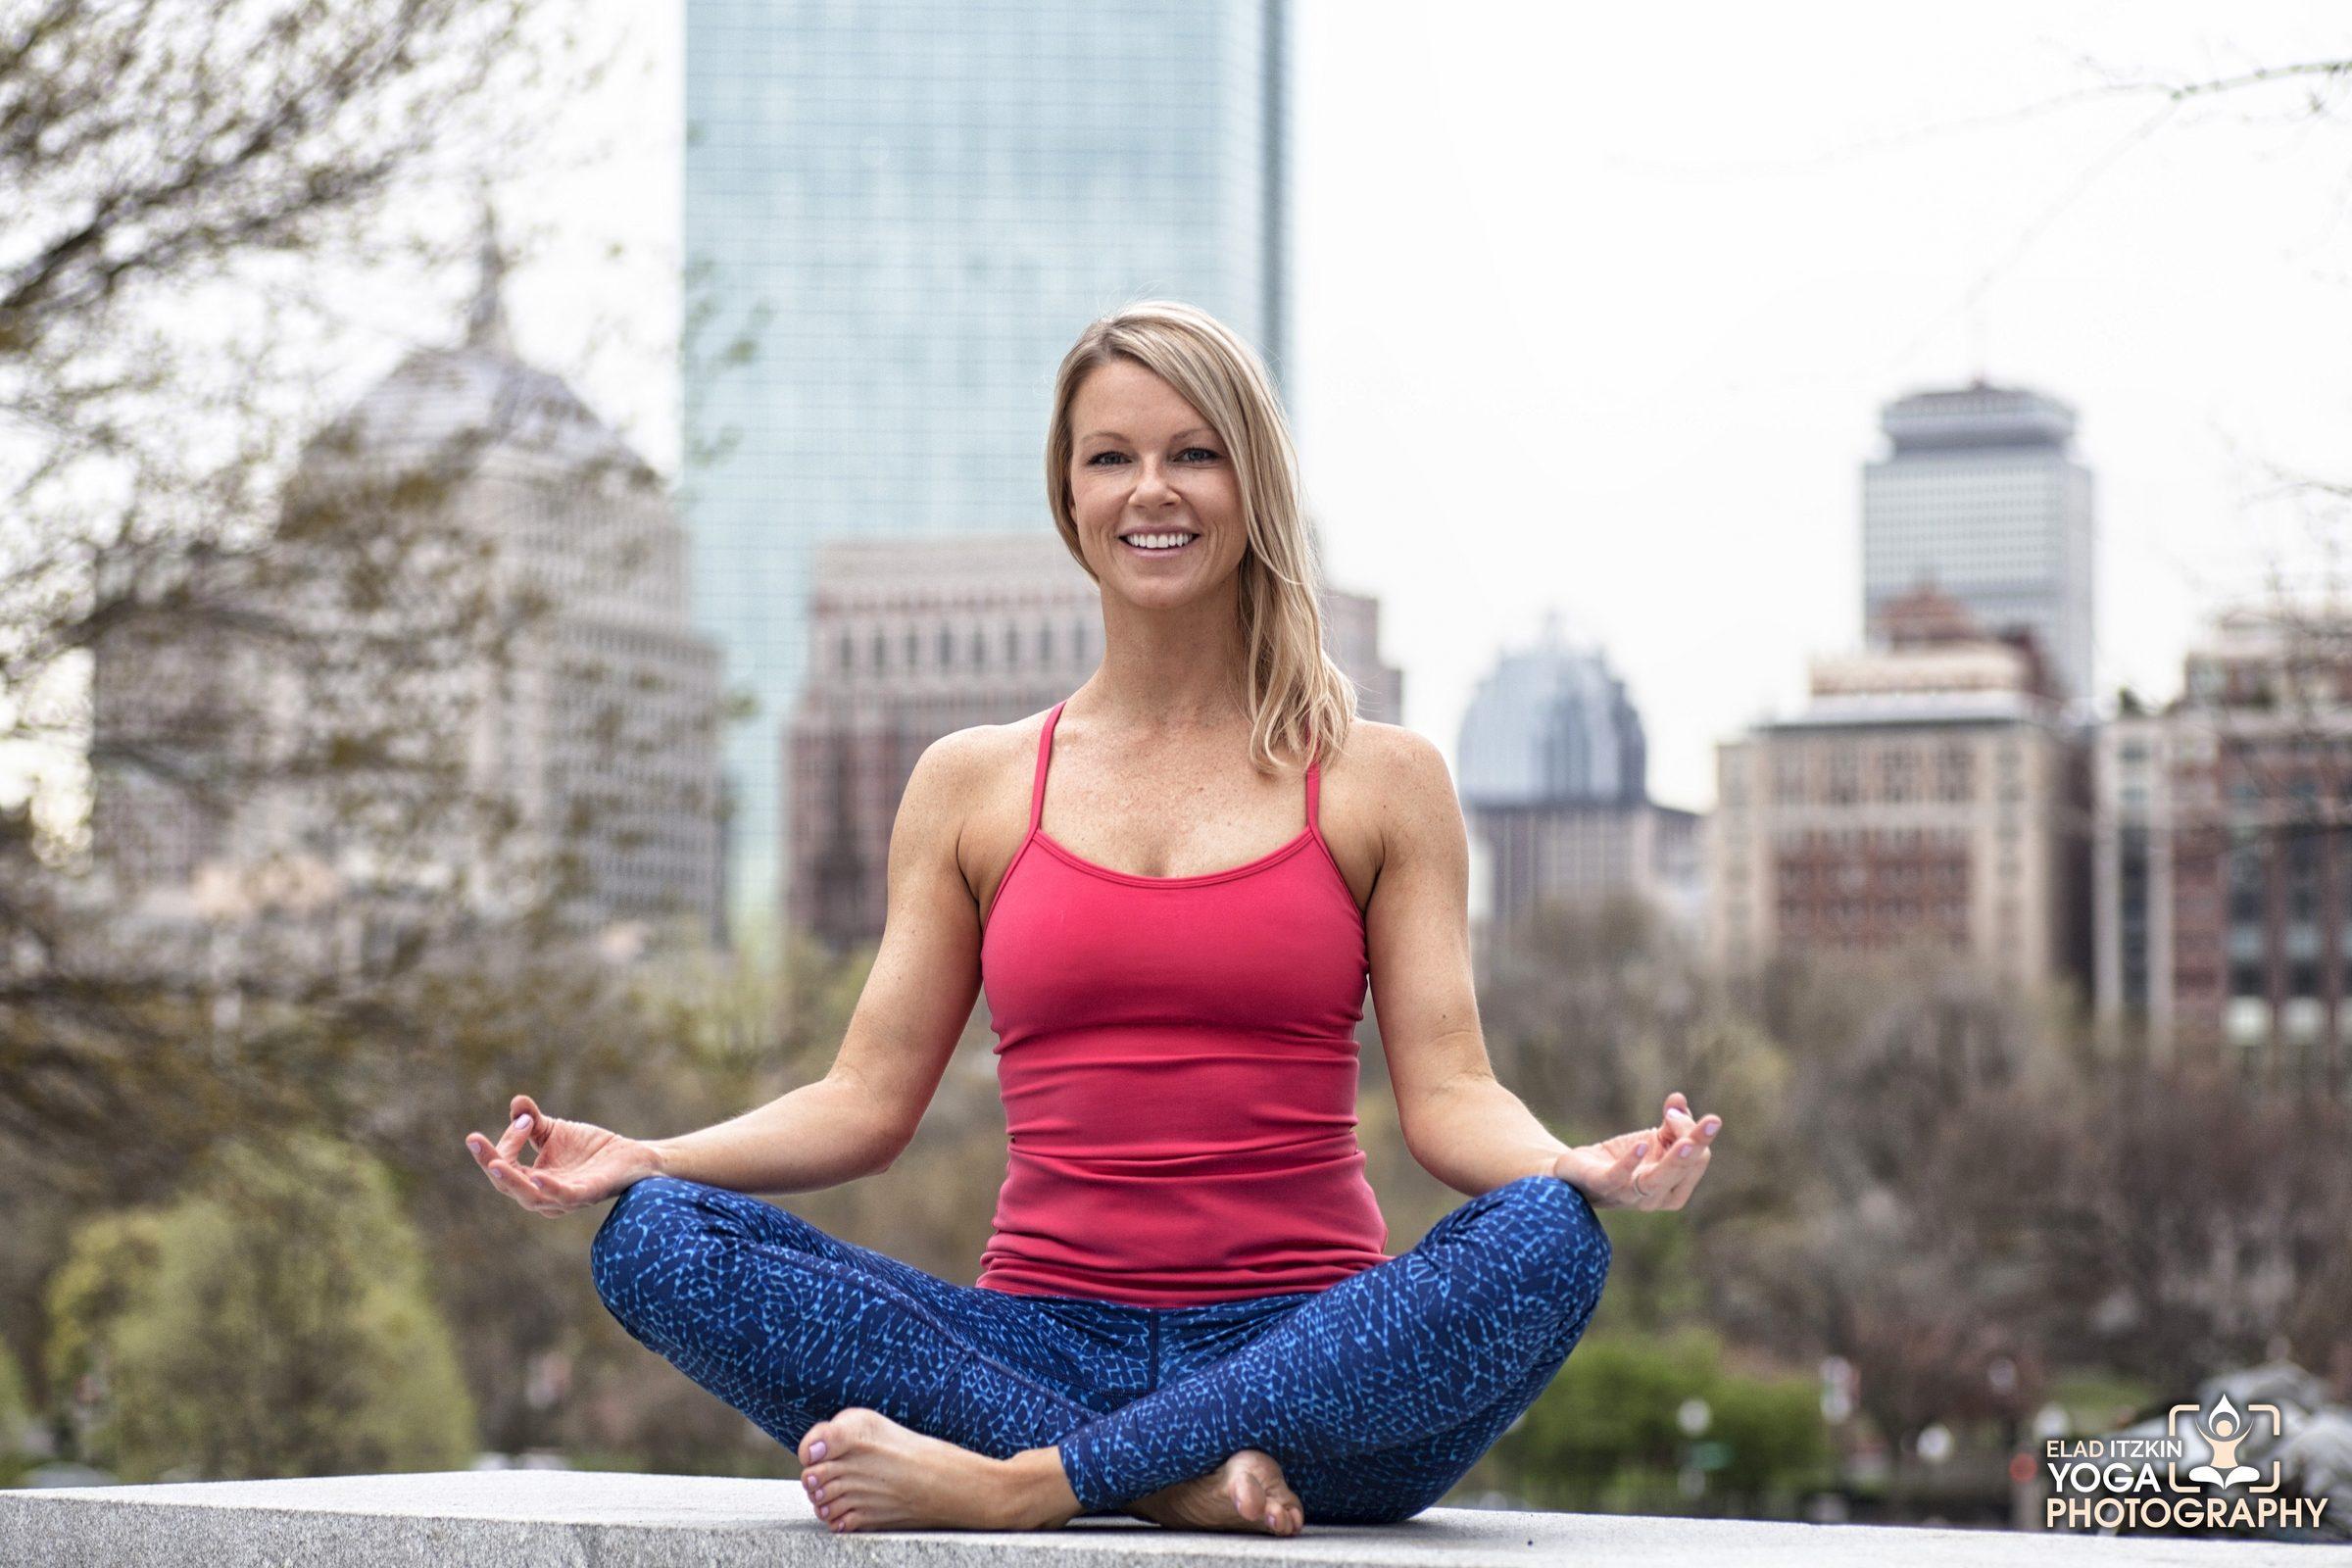 Meghan Rozanski Yoga Photos, Boston, Massachusetts, United State of America - Elad Itzkin Yoga Photography